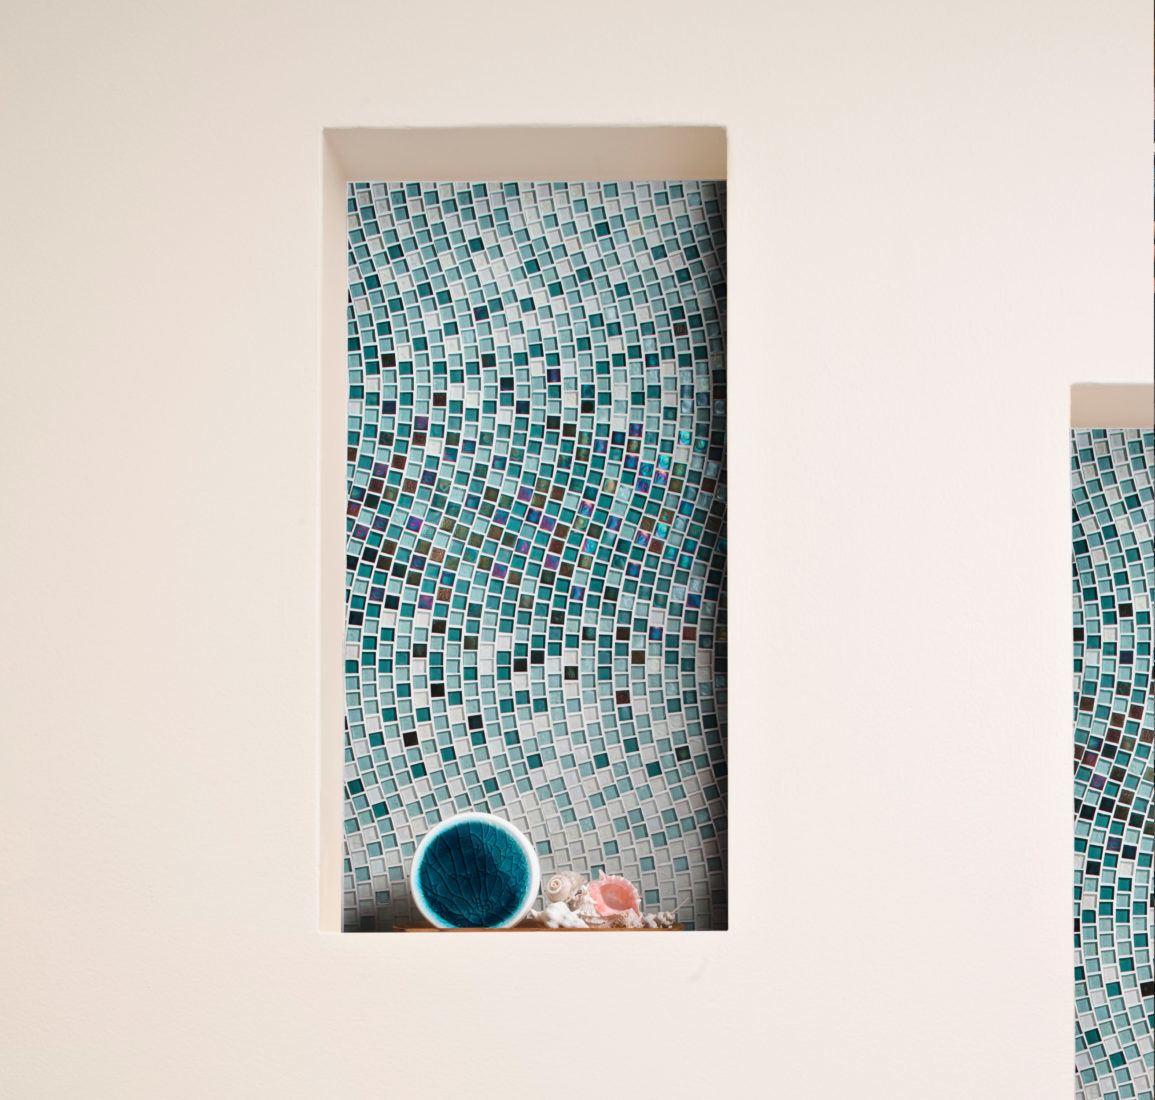 Grant Nook Living Room Wall Tile